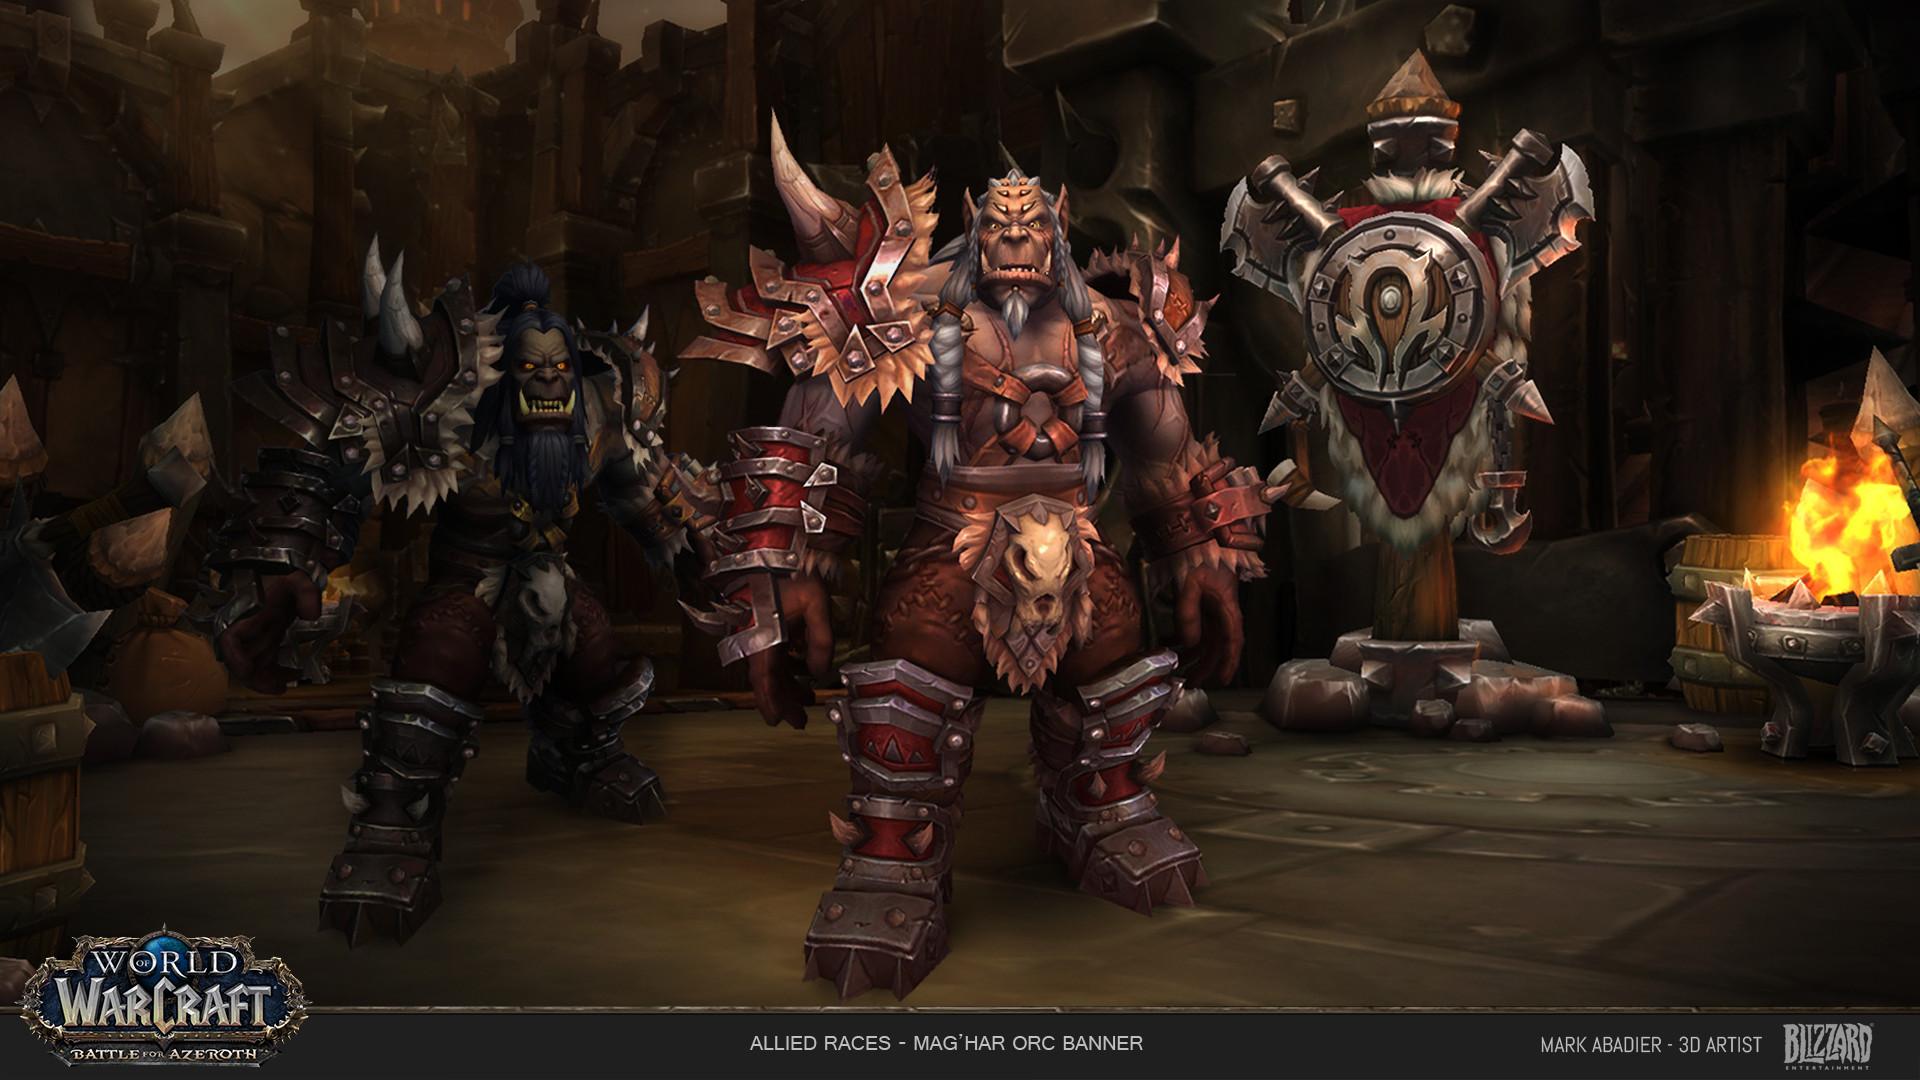 ArtStation - Allied Race - Mag'har Orc Banner, Mark Abadier